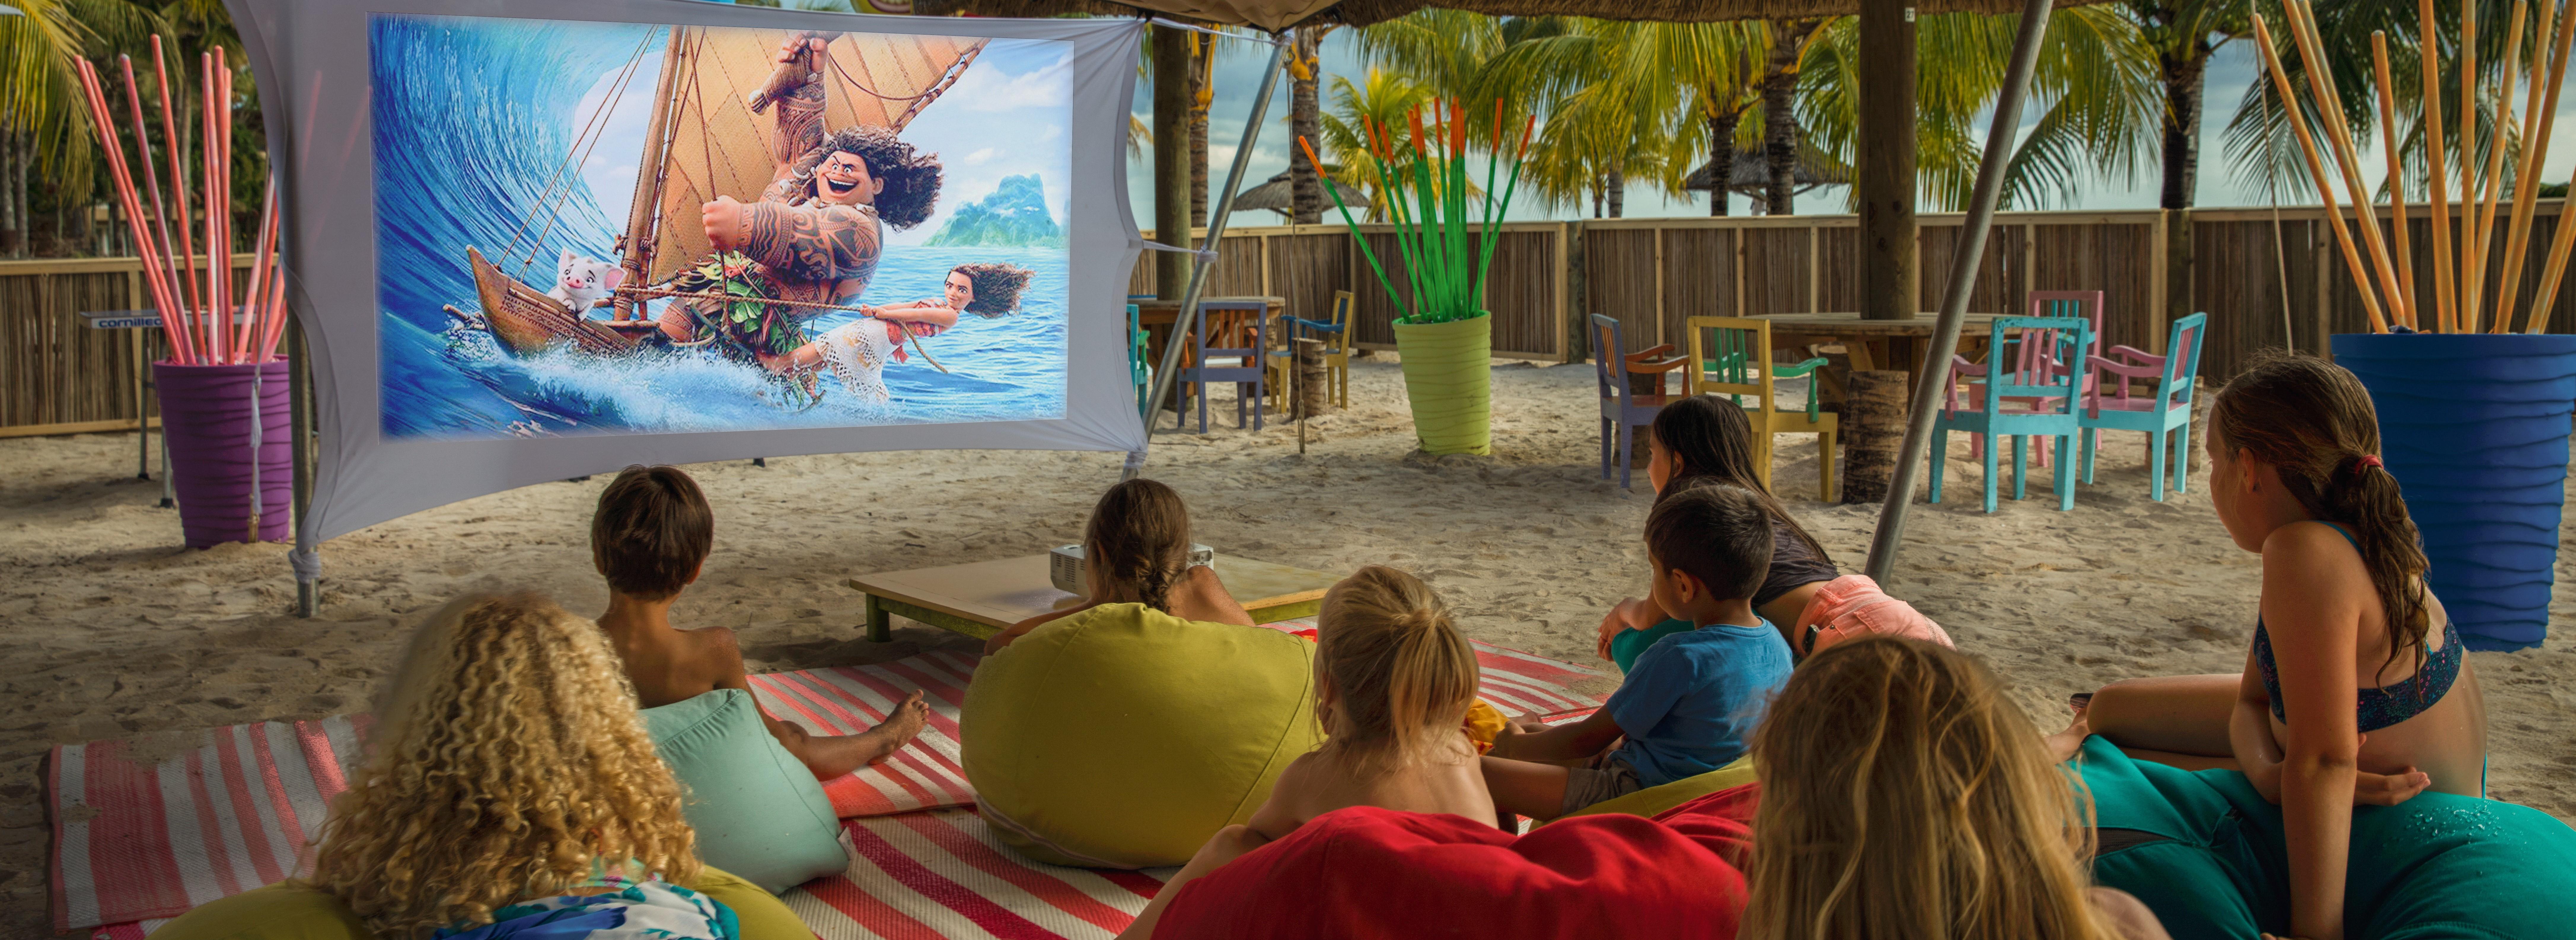 victoria-mauritius-kids-club-beach-cinem